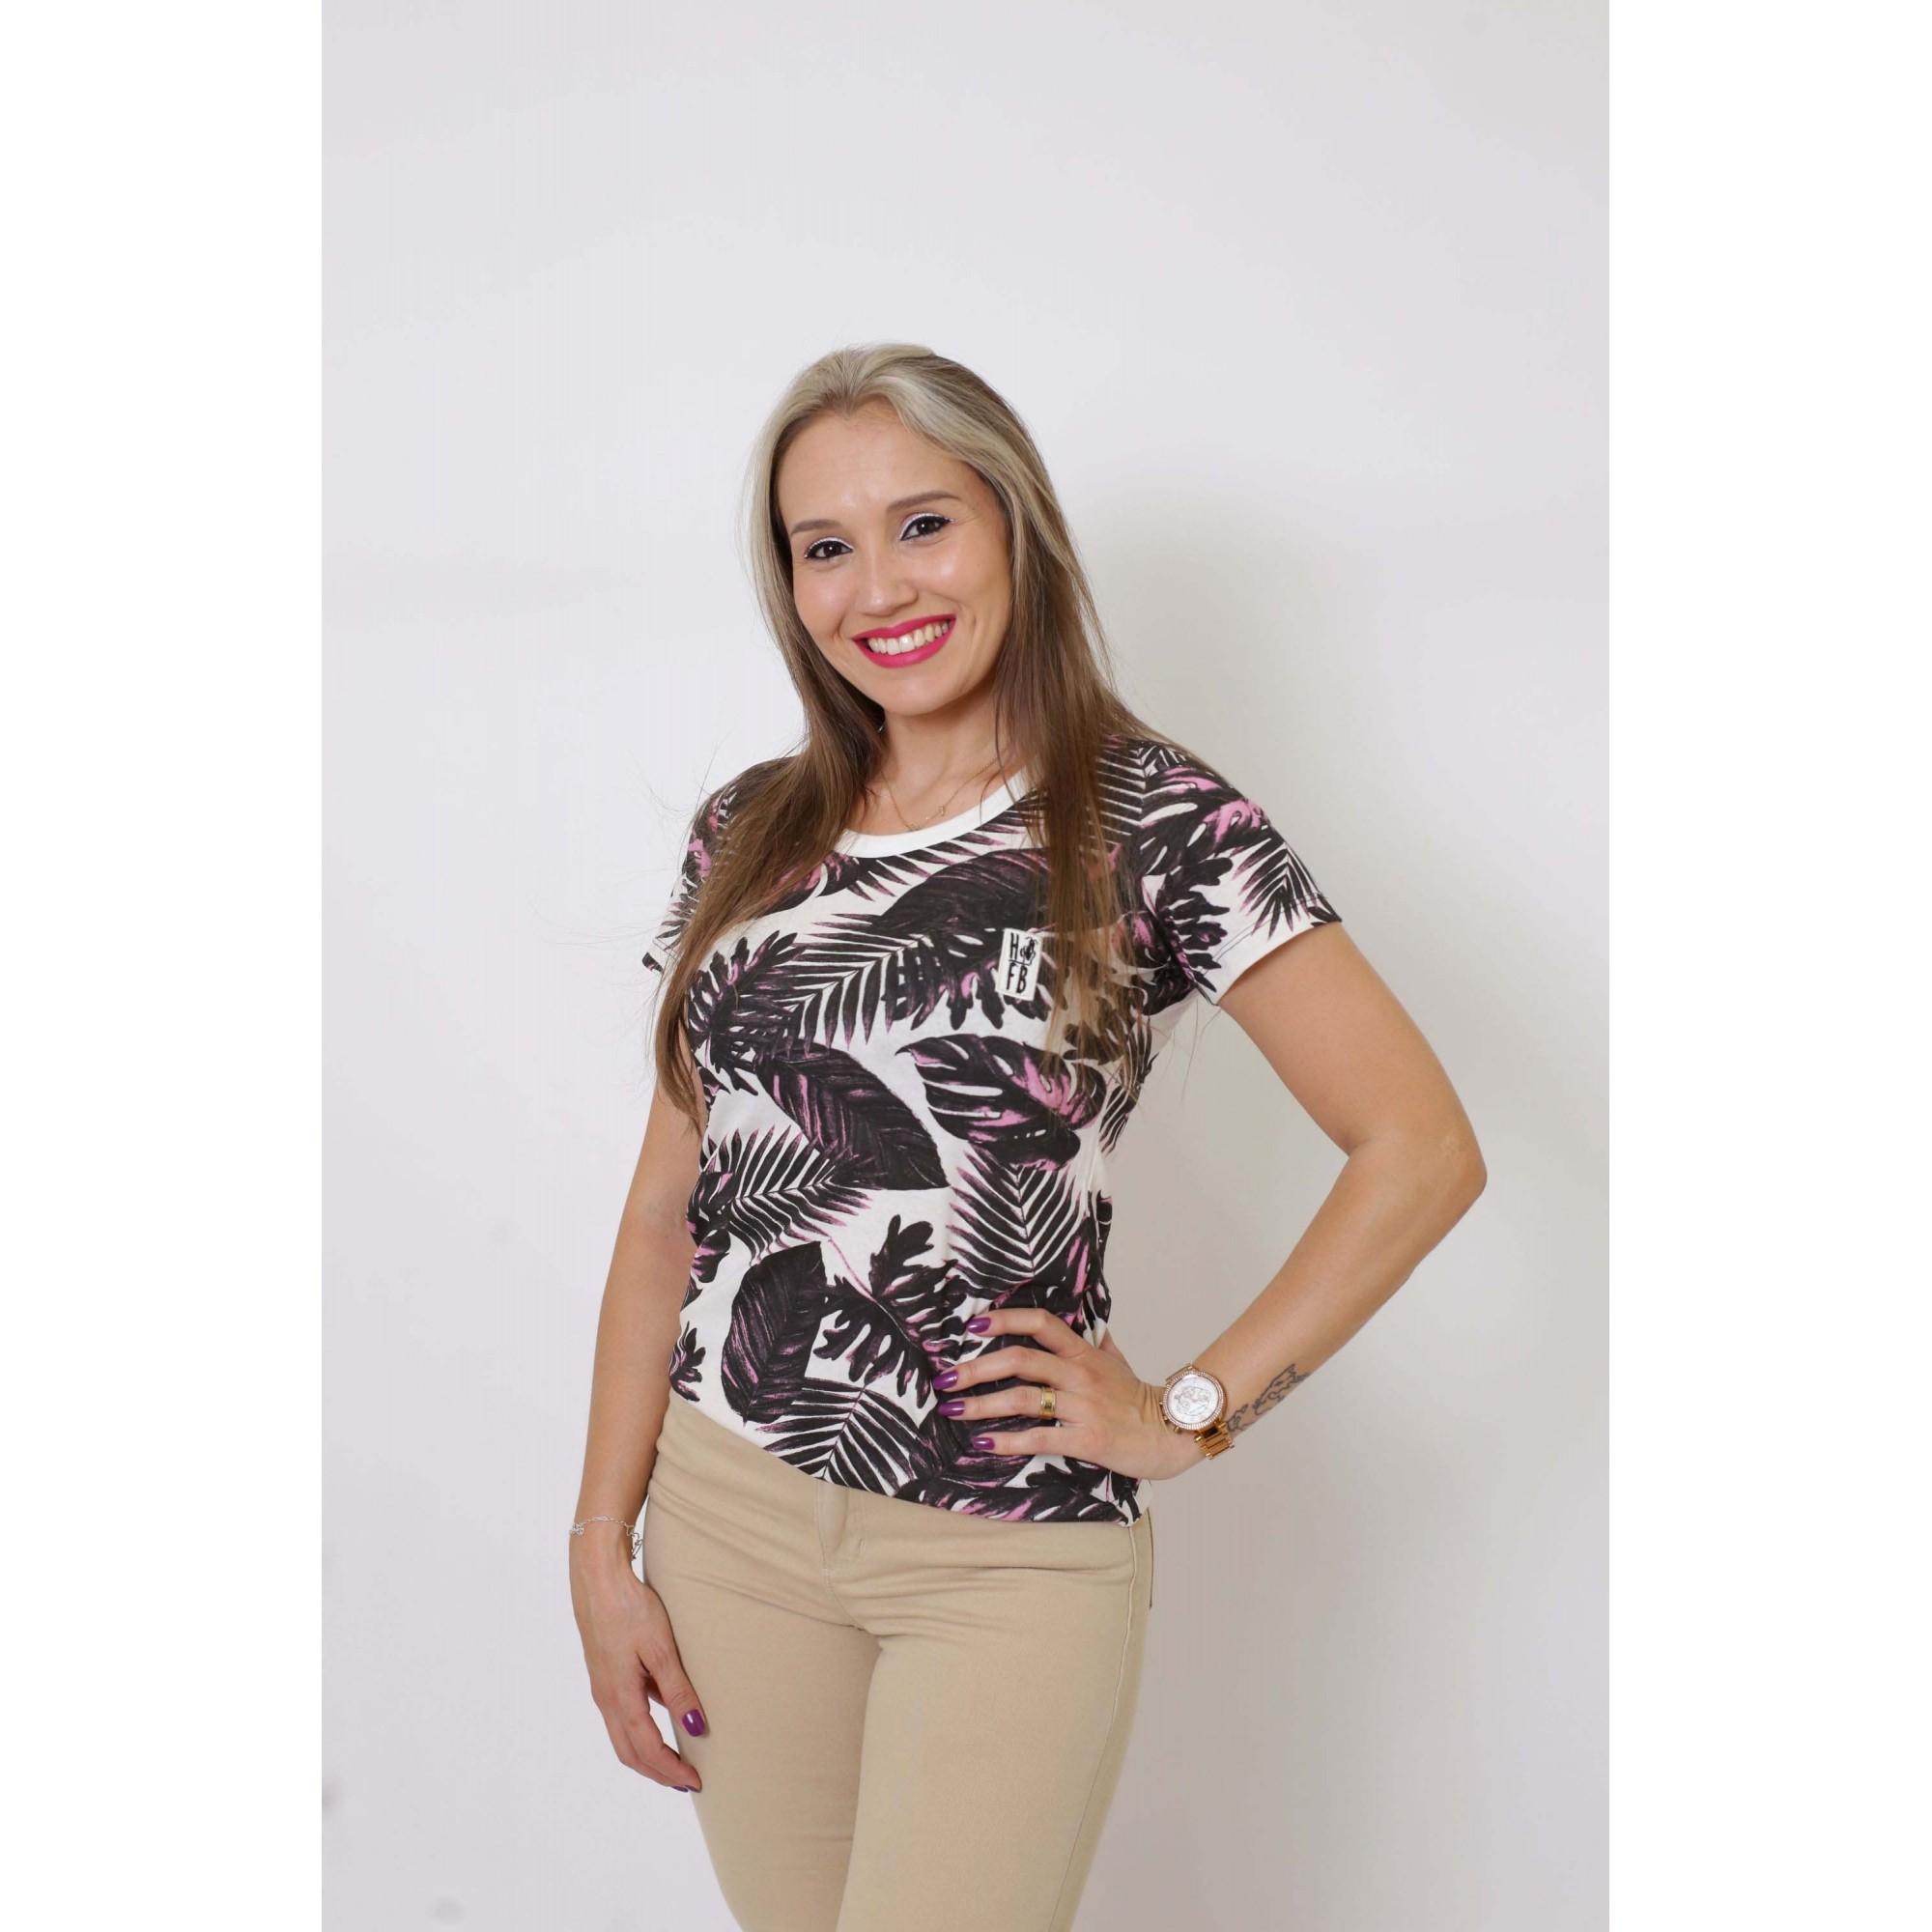 MÃE E FILHO > Kit 02 Peças - T-Shirts ou Body Cancún [Coleção Tal Mãe Tal Filho]  - Heitor Fashion Brazil